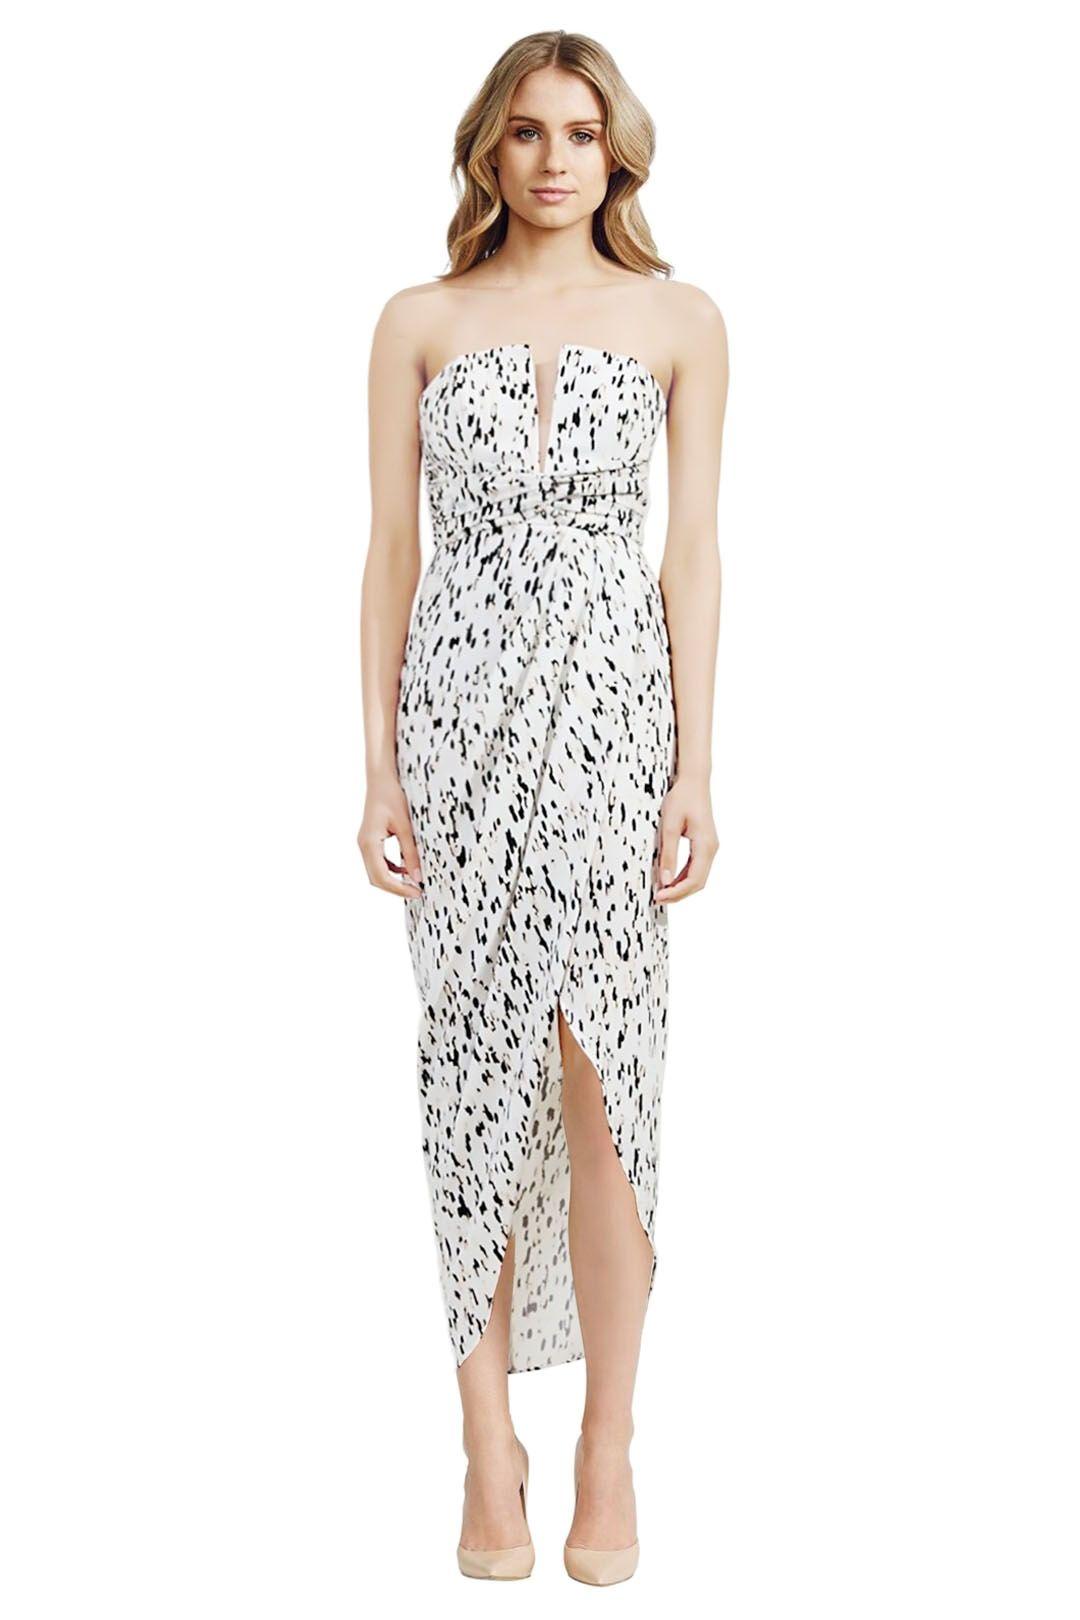 Shona Joy - Deia Draped Maxi Dress - Prints - Front